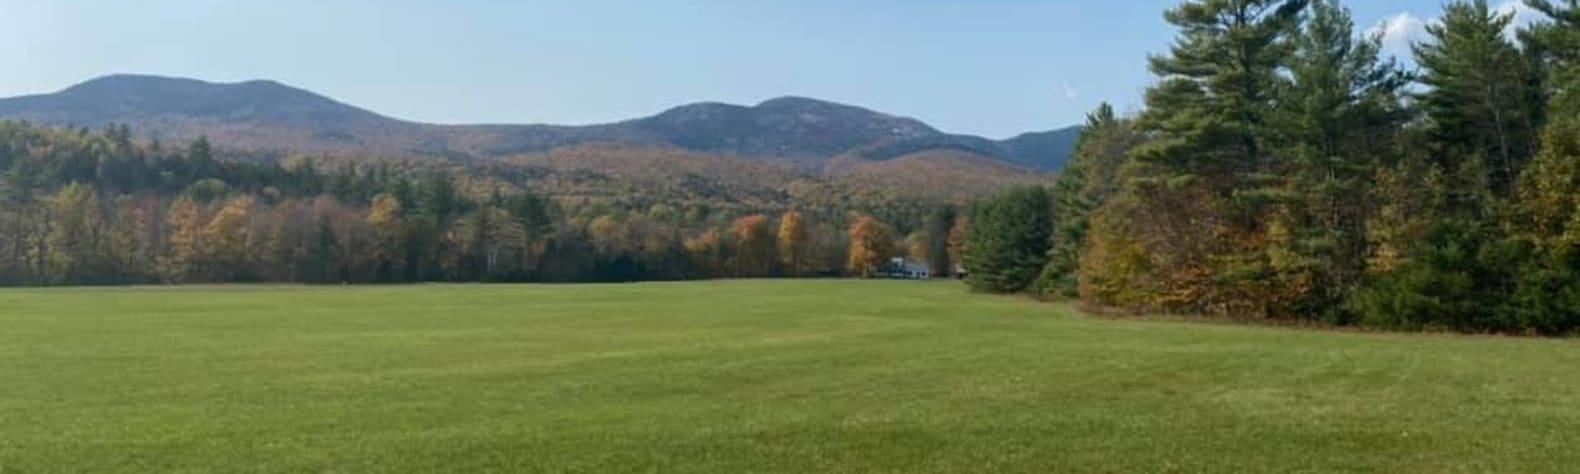 Carolyn L.'s Land